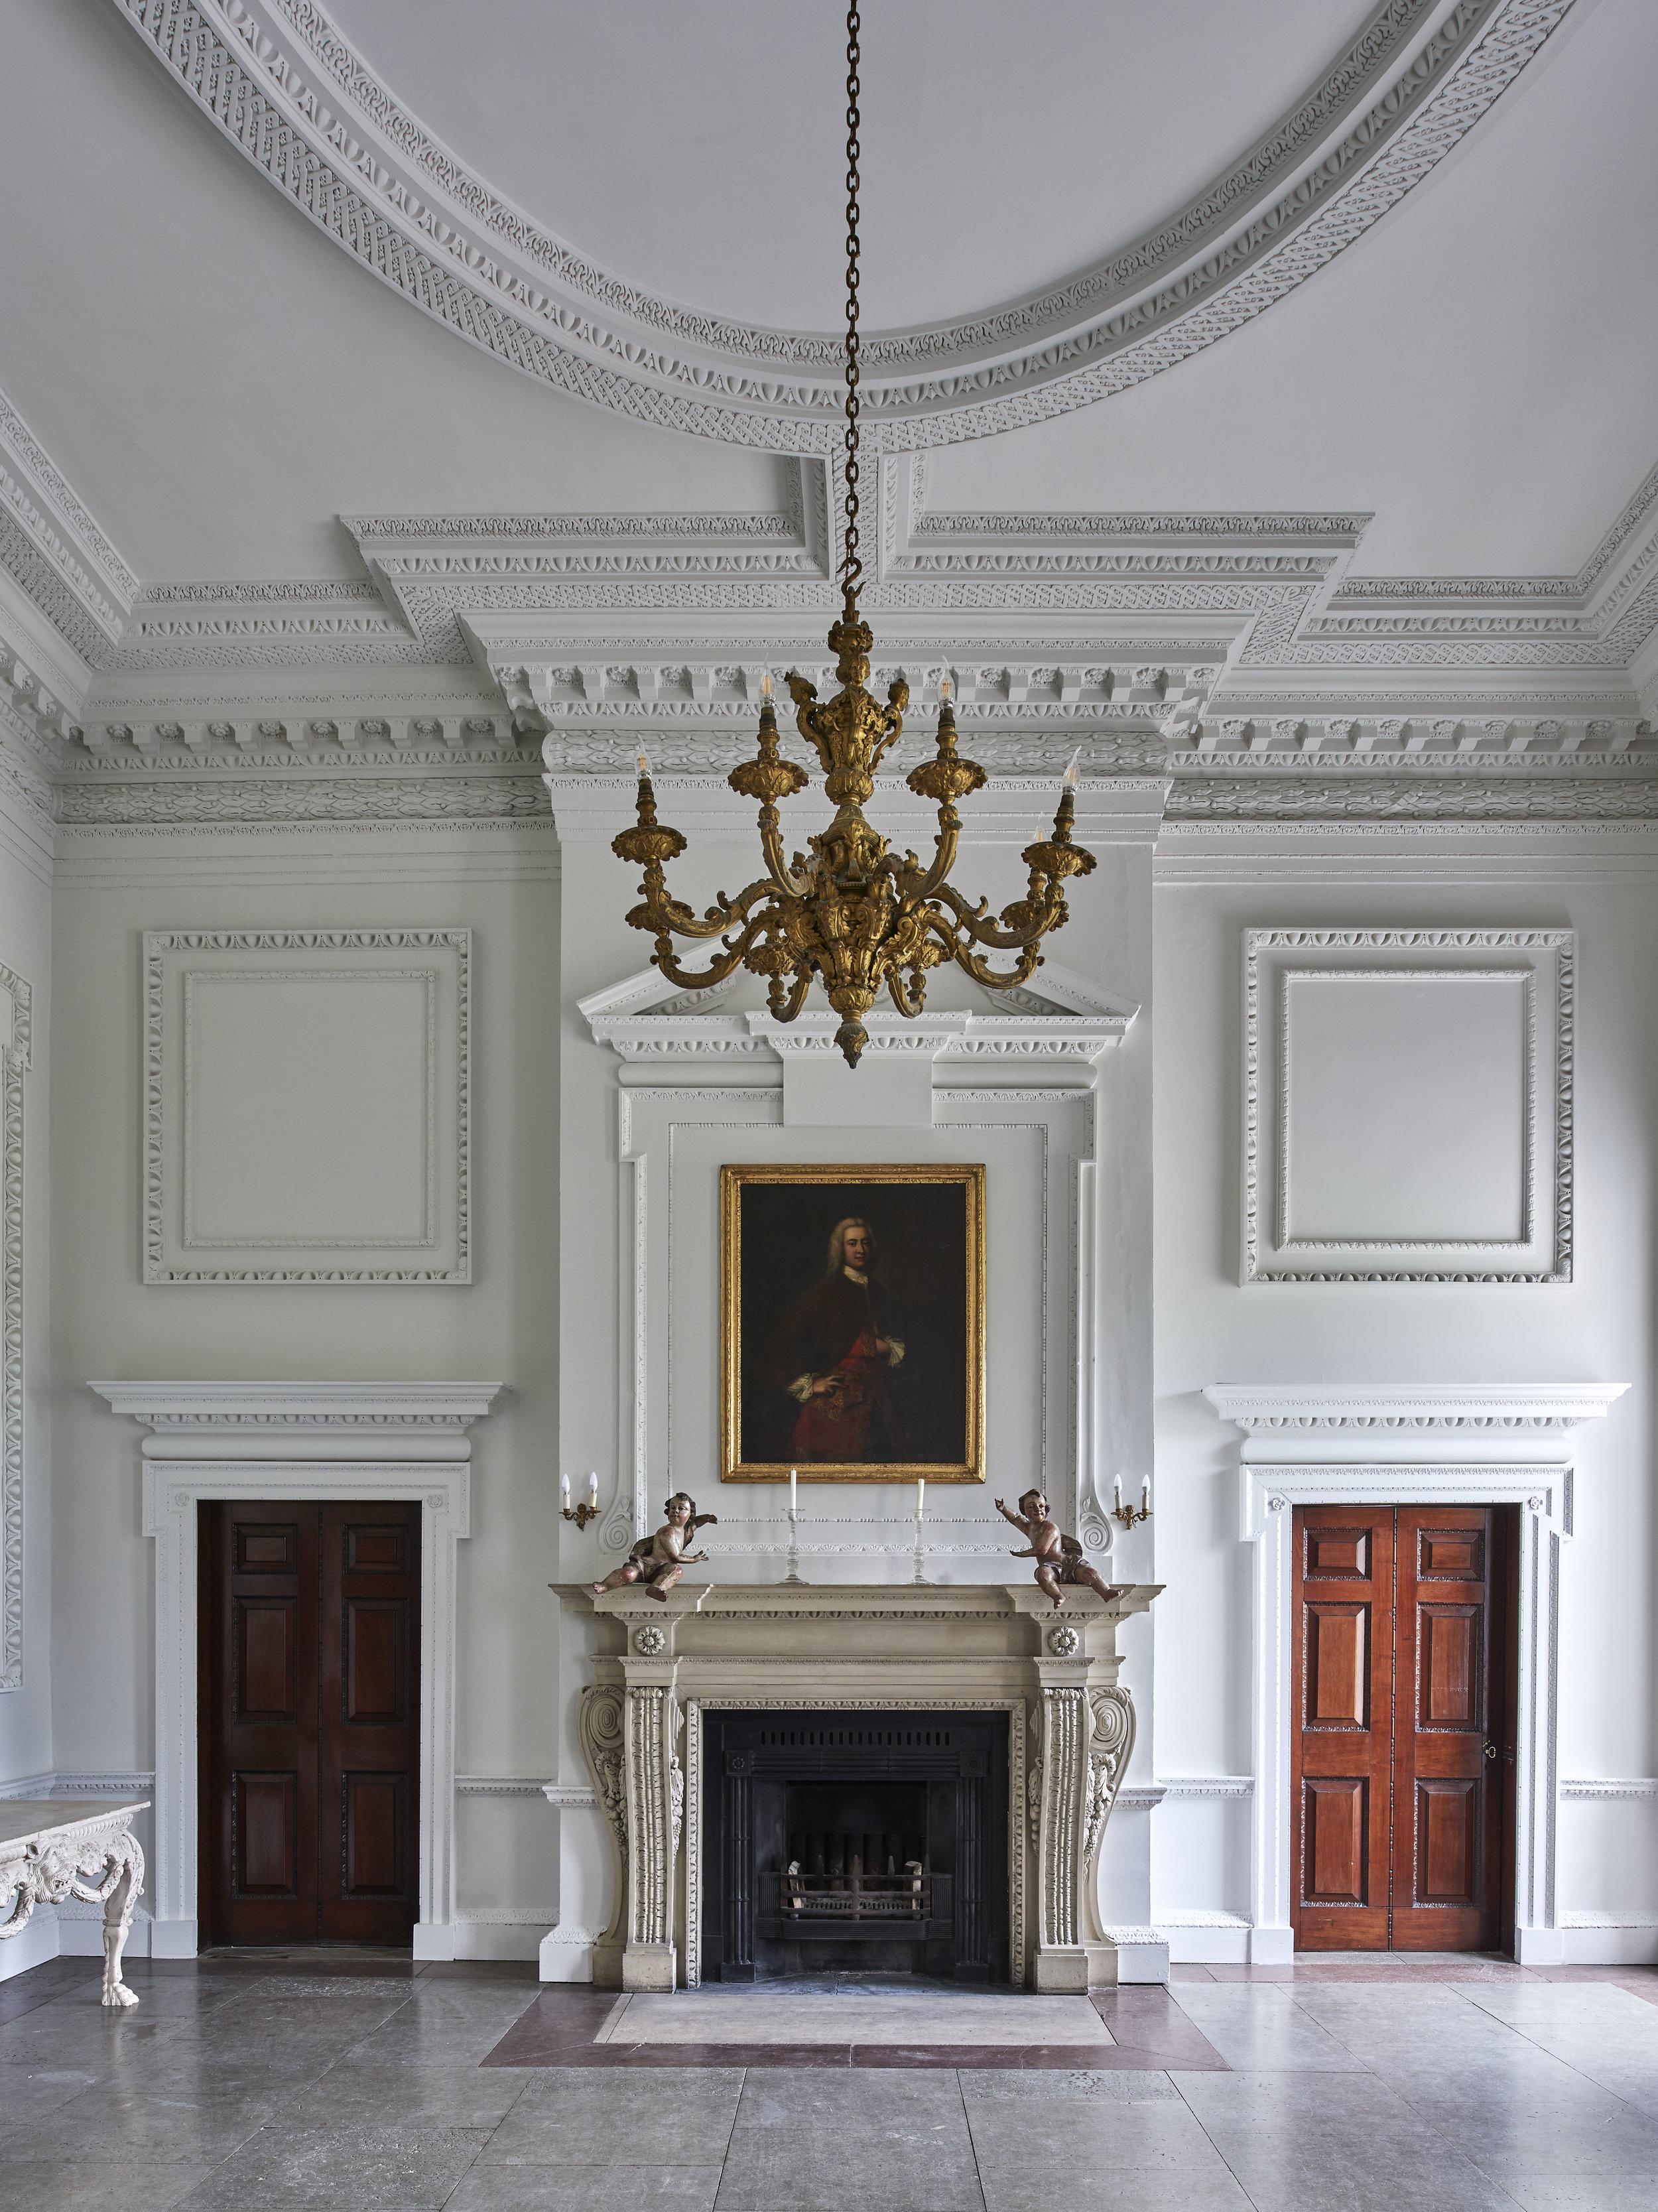 190207-Wolterton-Hall-Shot 02-032_RT.jpg